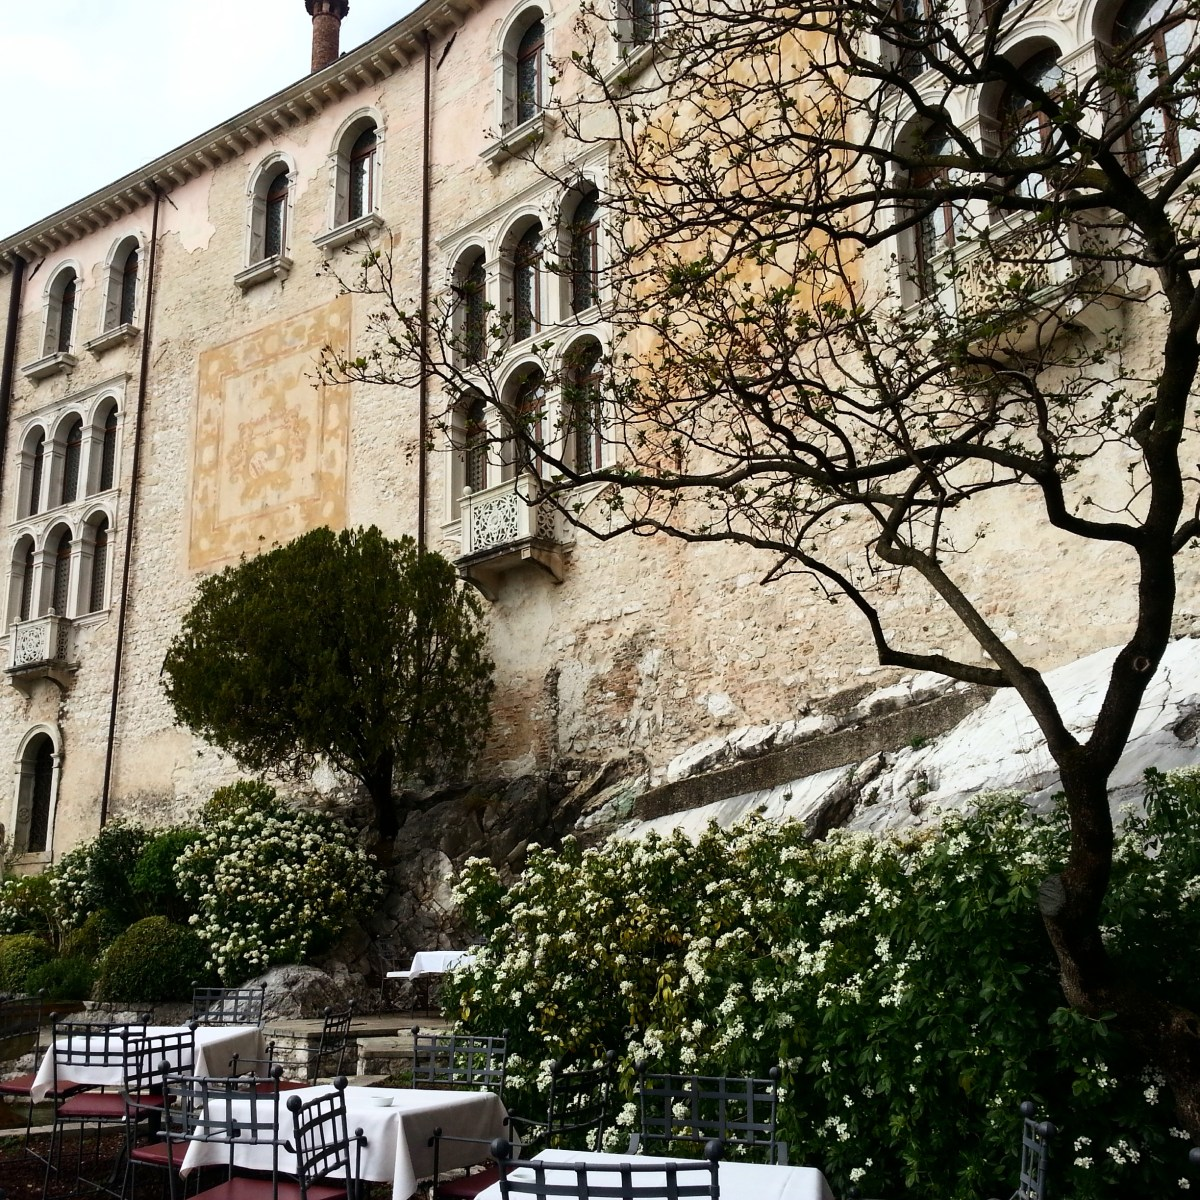 Hotel A Treviso Centro Storico